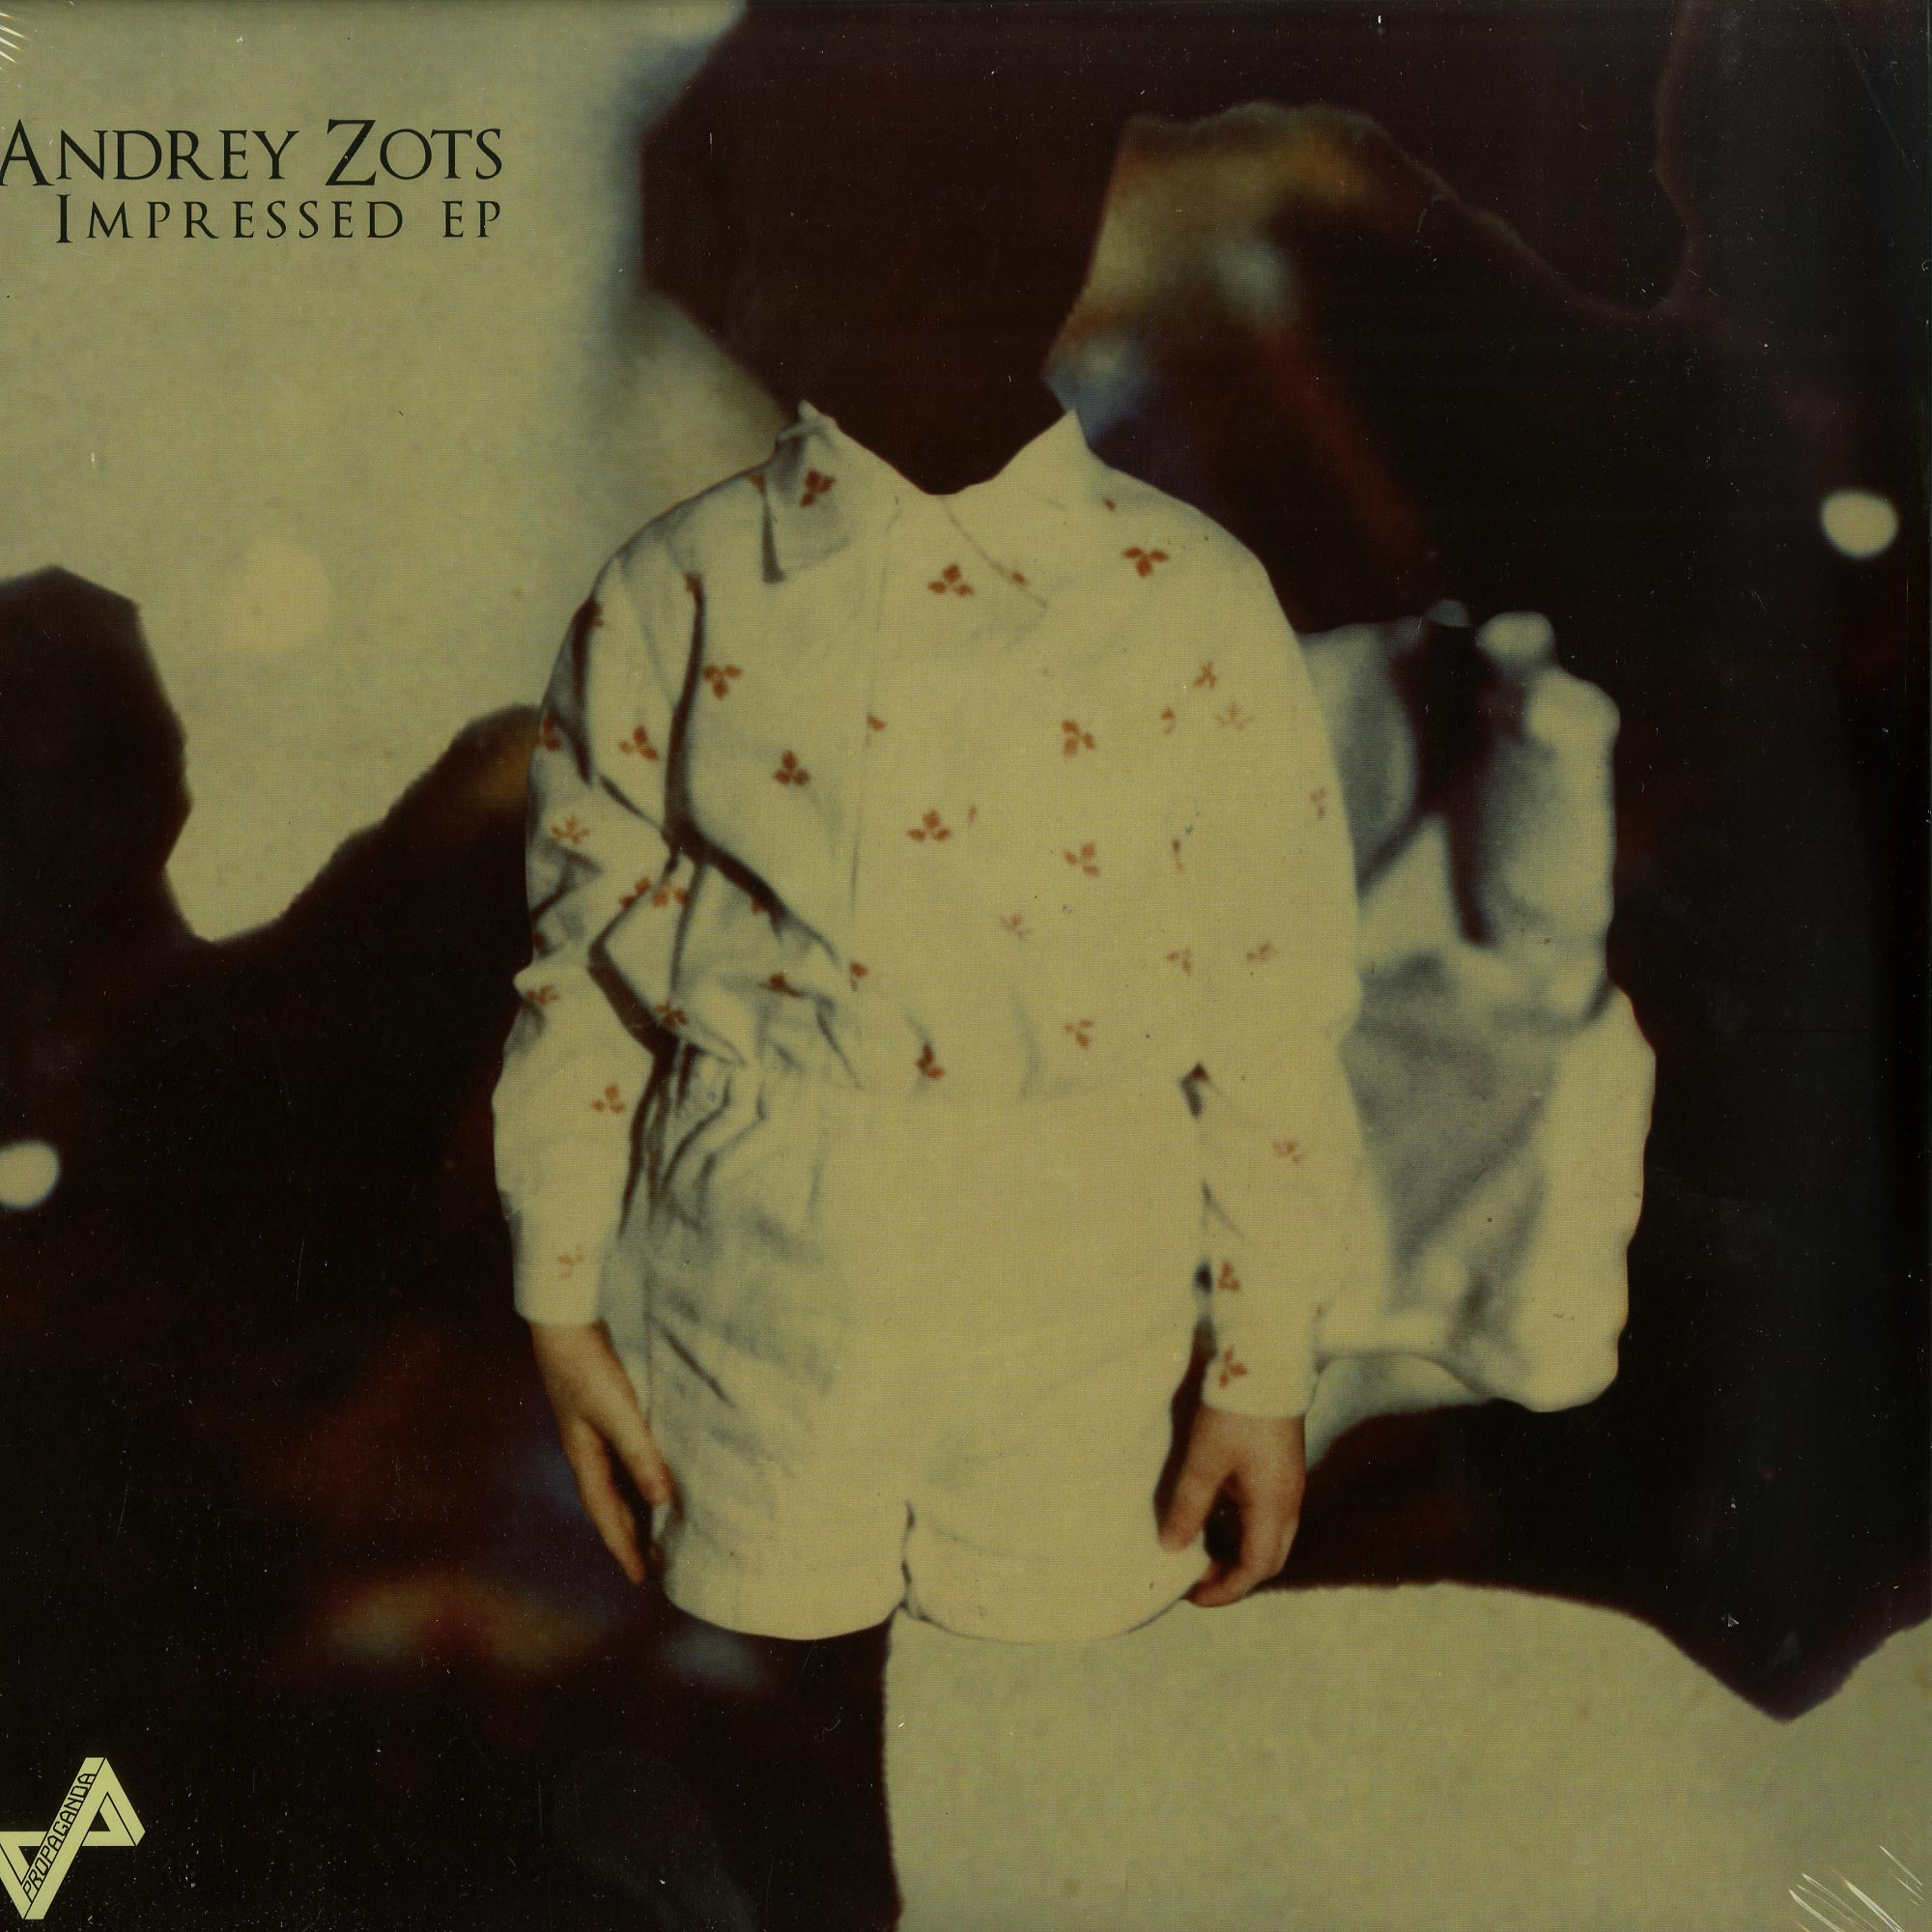 Andrey Zots - IMPRESSED EP